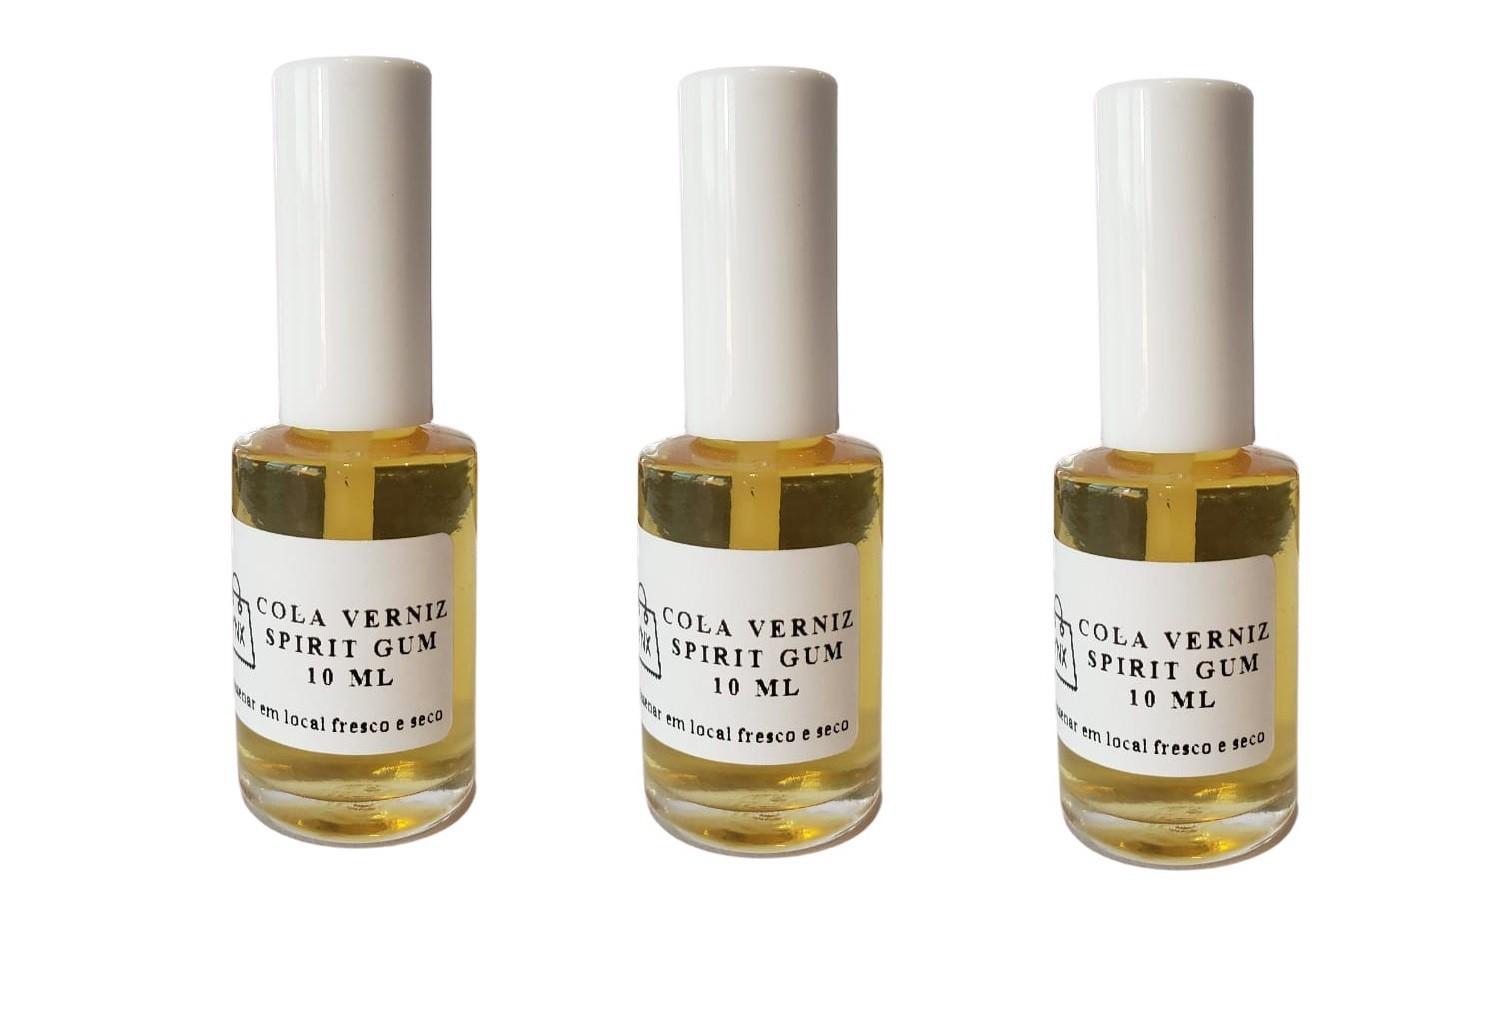 kit 5 Colas Spirit Gum verniz p/ laces e perucas c/ aplicador